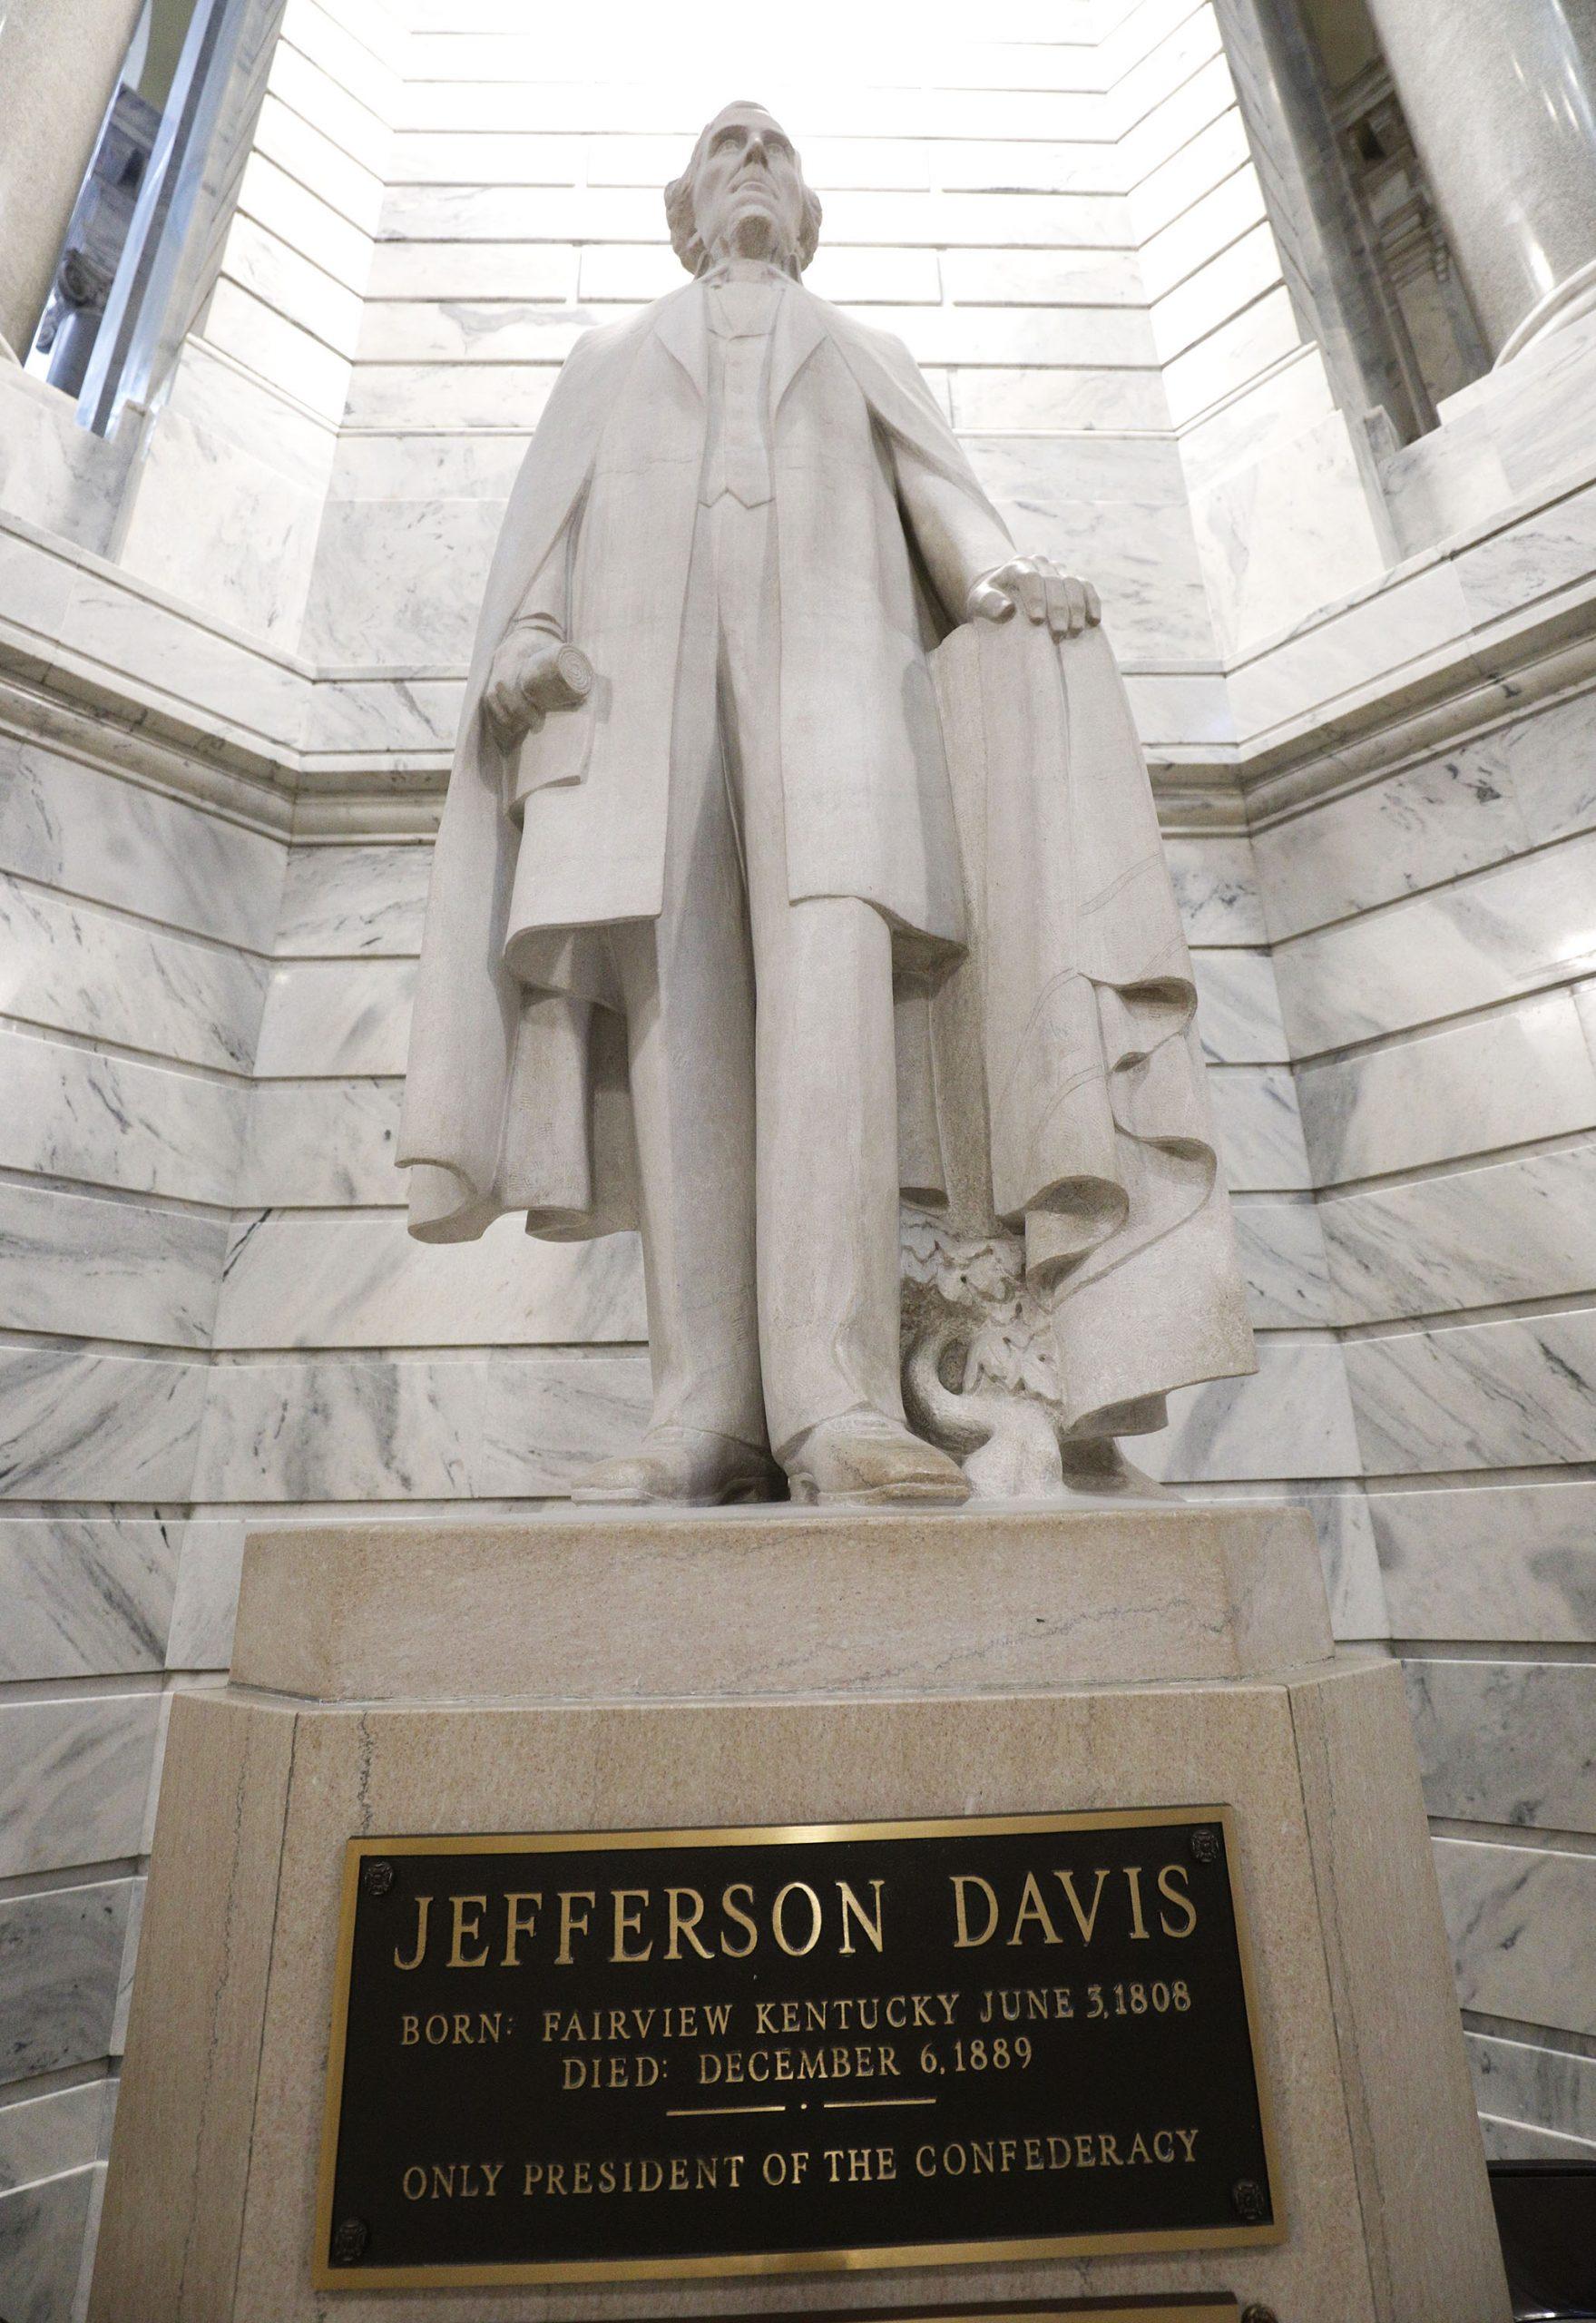 Civil War Leader Jefferson Davis Statue Being Removed After Finding Surprise Inside Its Base